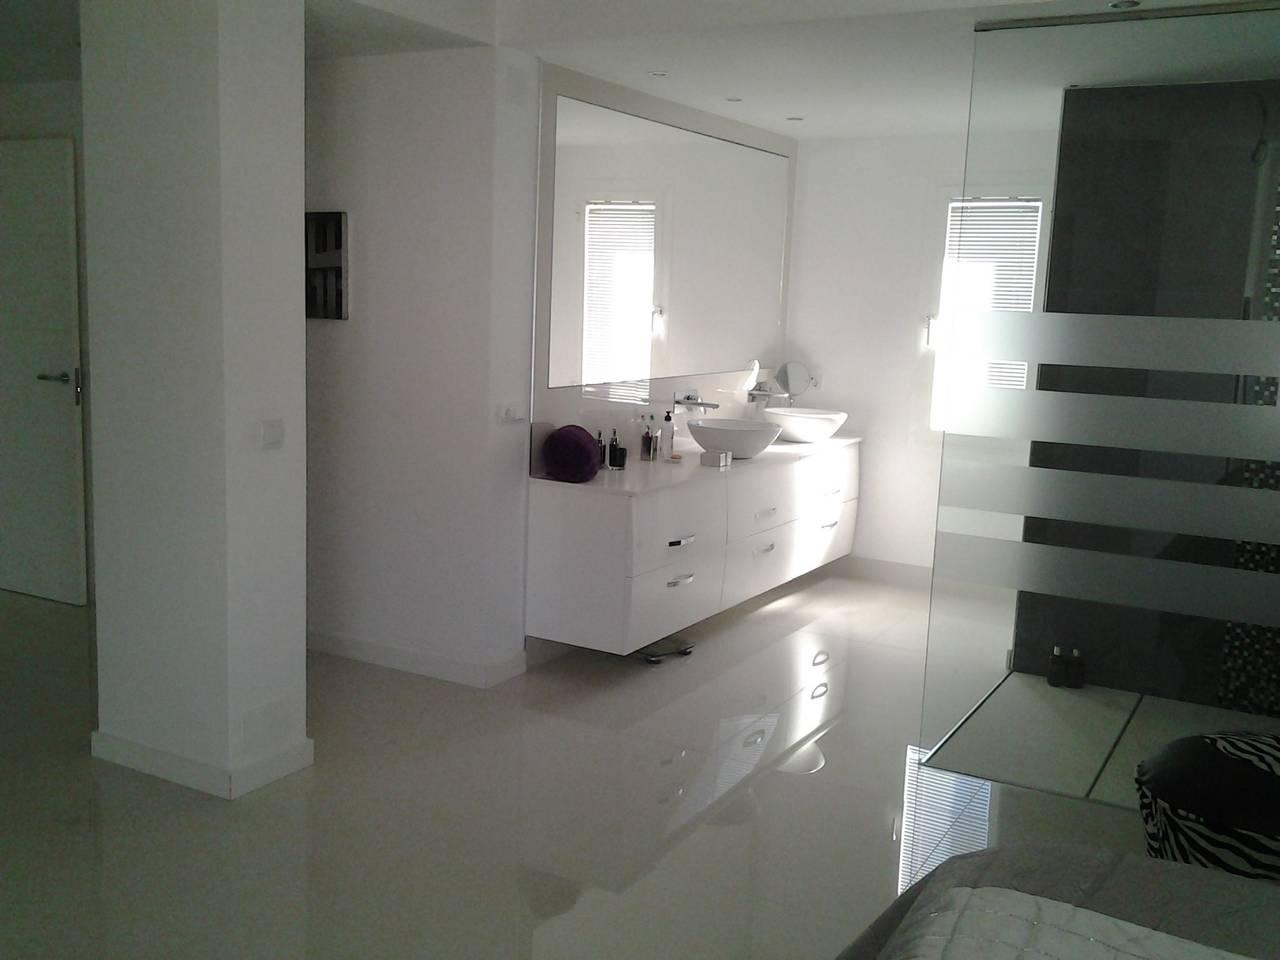 Apartment luxury 6 rooms villa with pool   jacuzzi - P banus photo 25684323